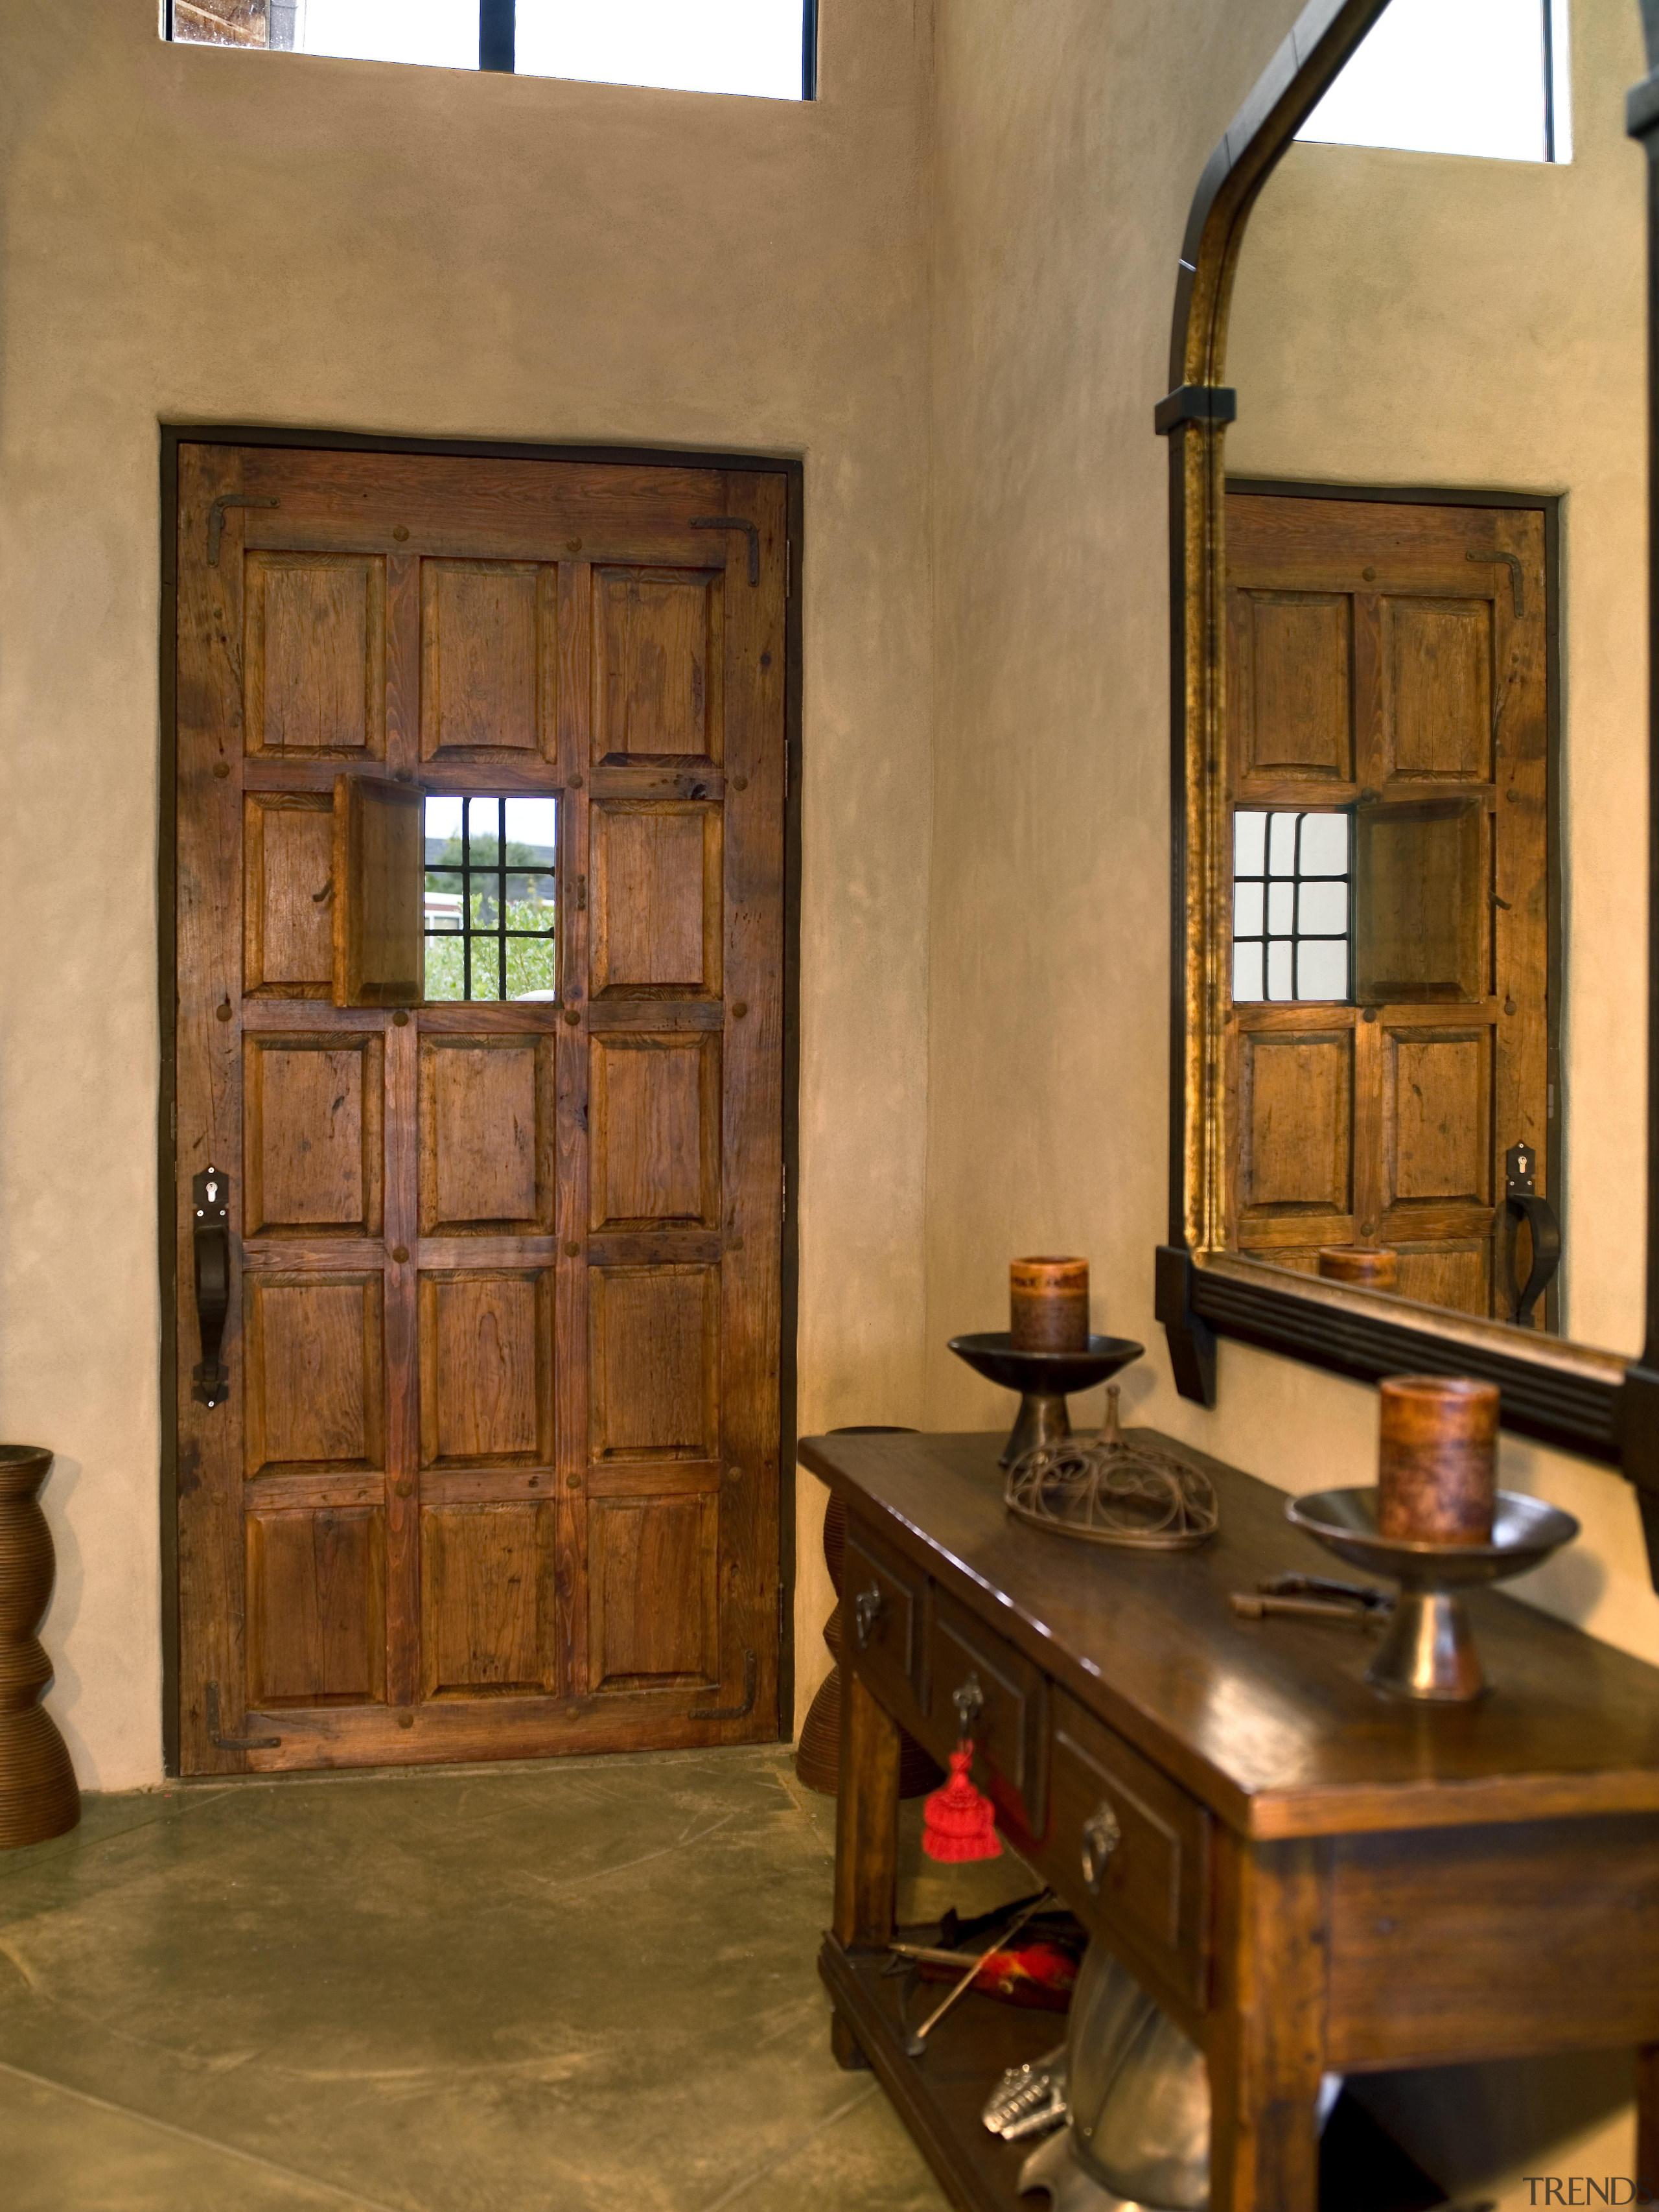 175mangawhai 18.jpg - 175mangawhai_18.jpg - door   furniture door, furniture, home, interior design, window, wood, brown